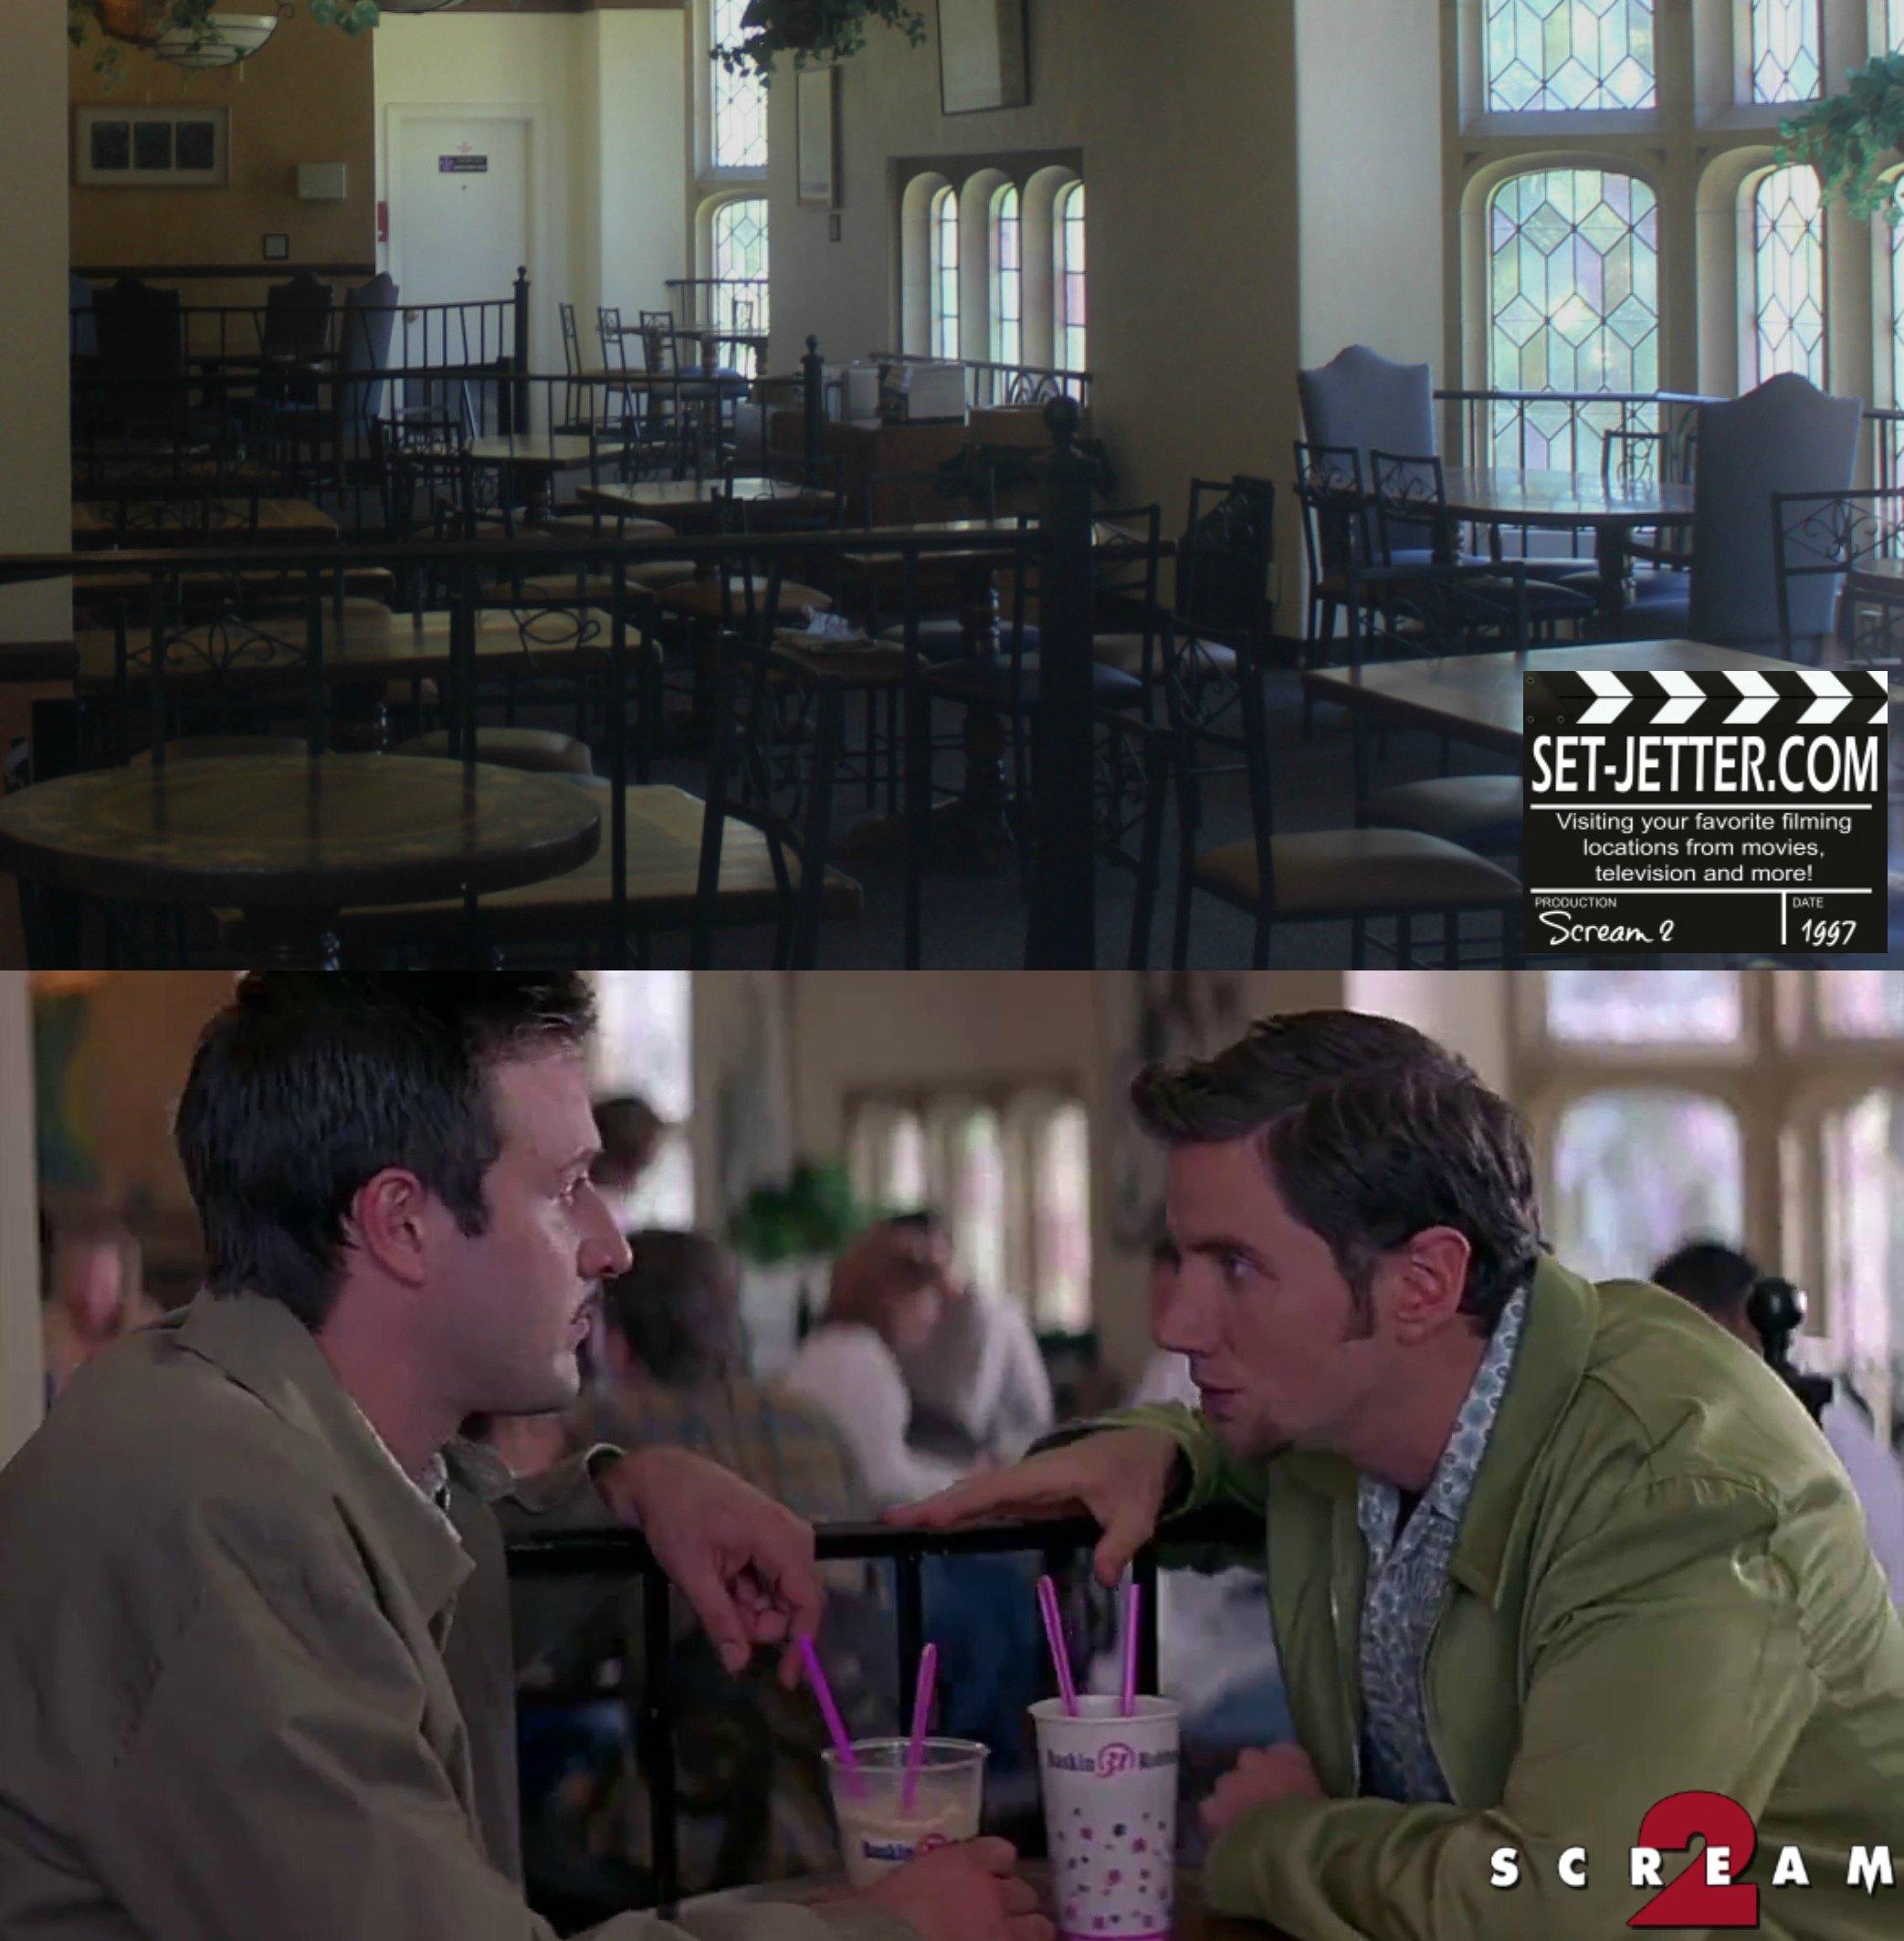 Scream 2 comparison 143.jpg